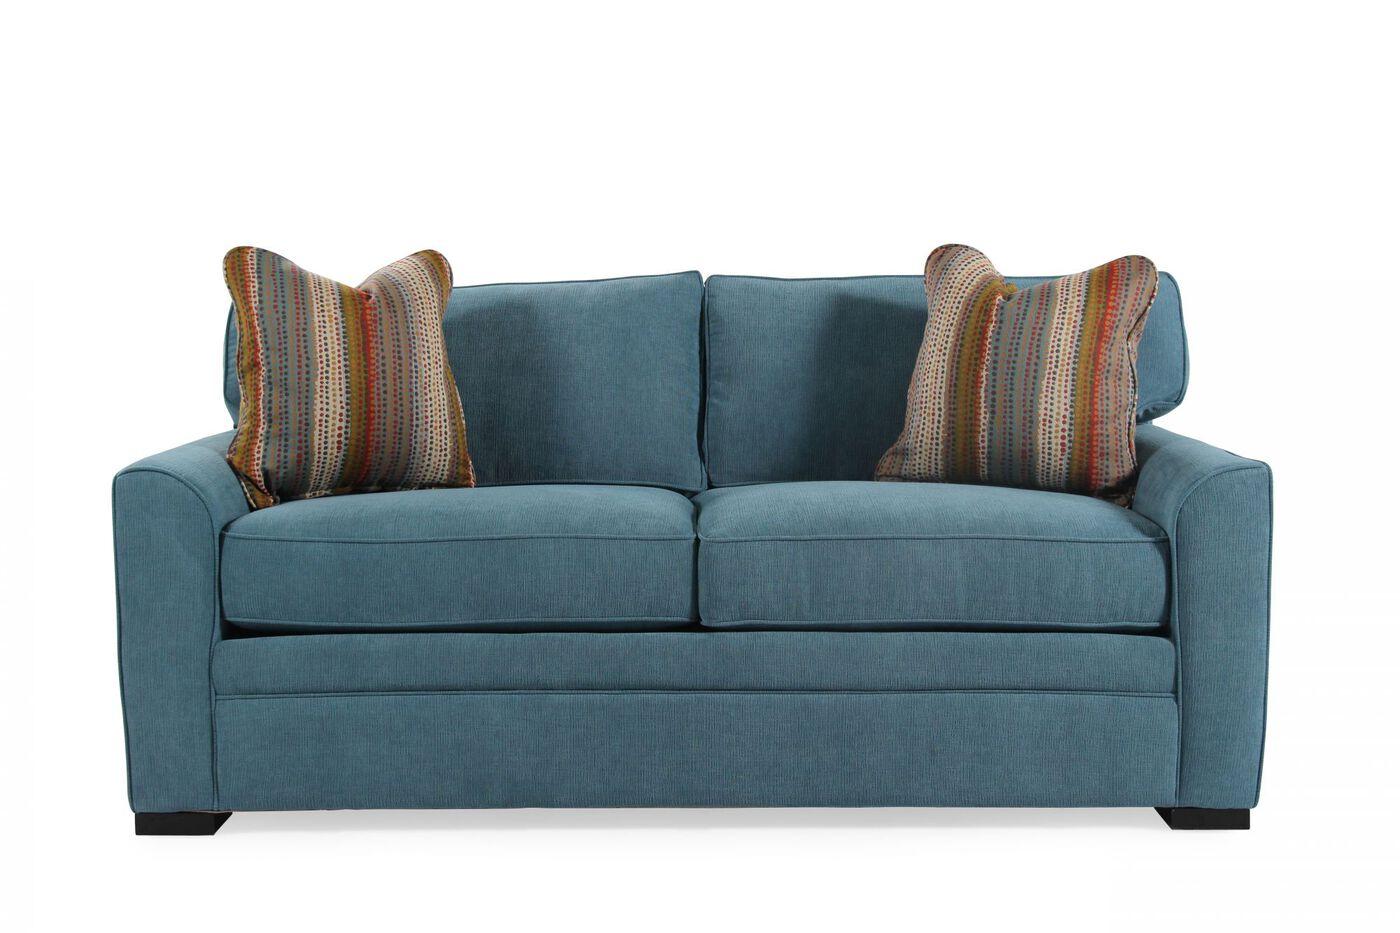 "Transitional 83"" Queen Sleeper Sofa in Sapphire Blue ..."